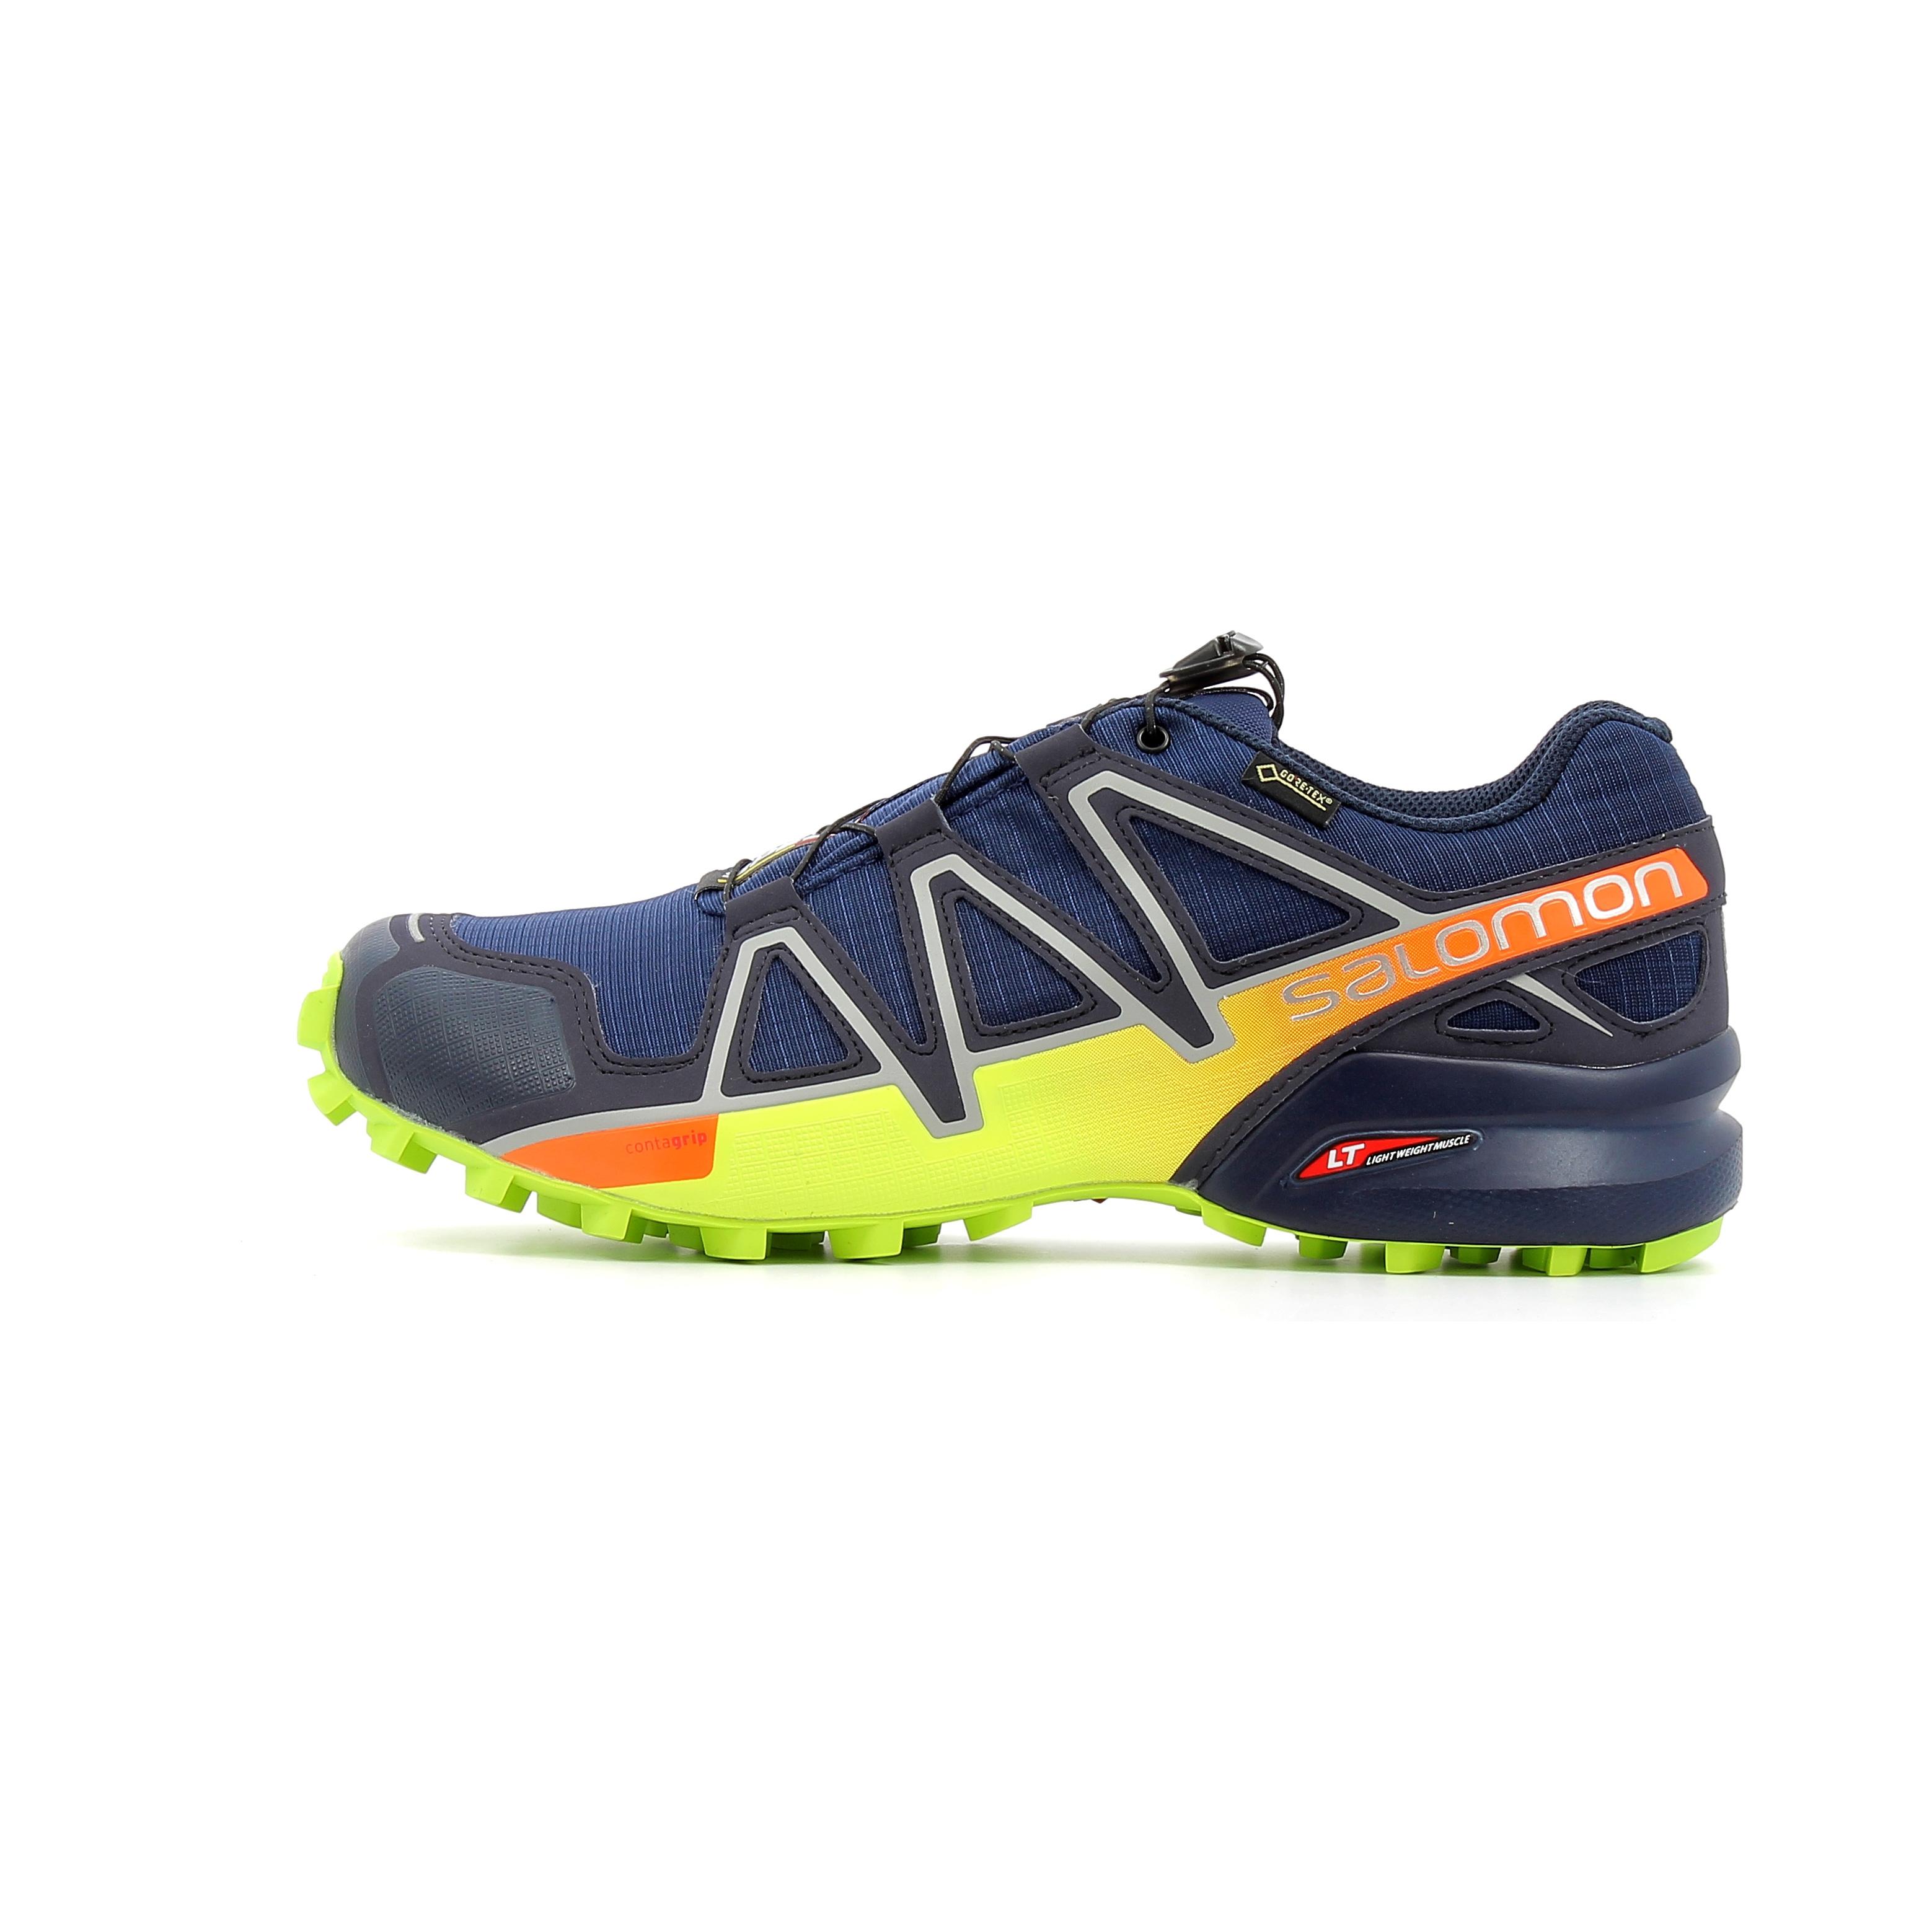 Homme Salomon SPEEDCROSS 4 GTX TRAIL Chaussures de running